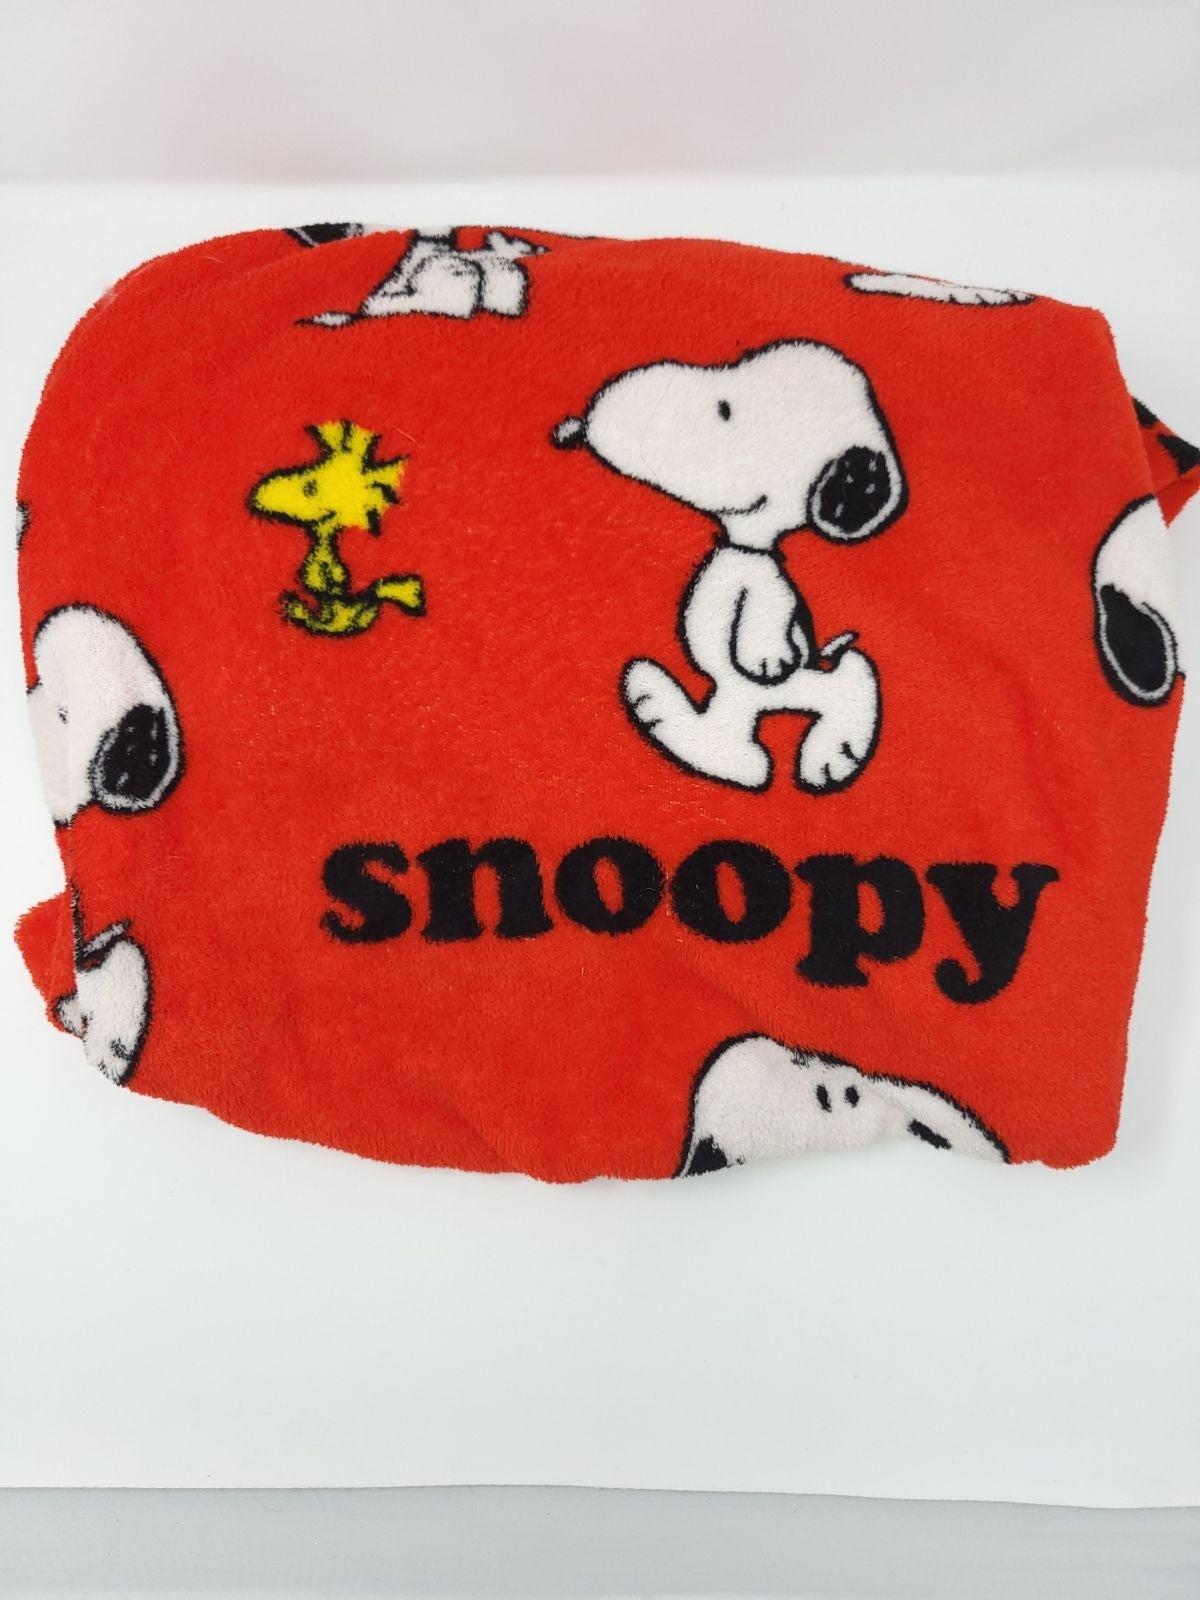 PEANUTS Snoopy Velvet soft Throw Blanket